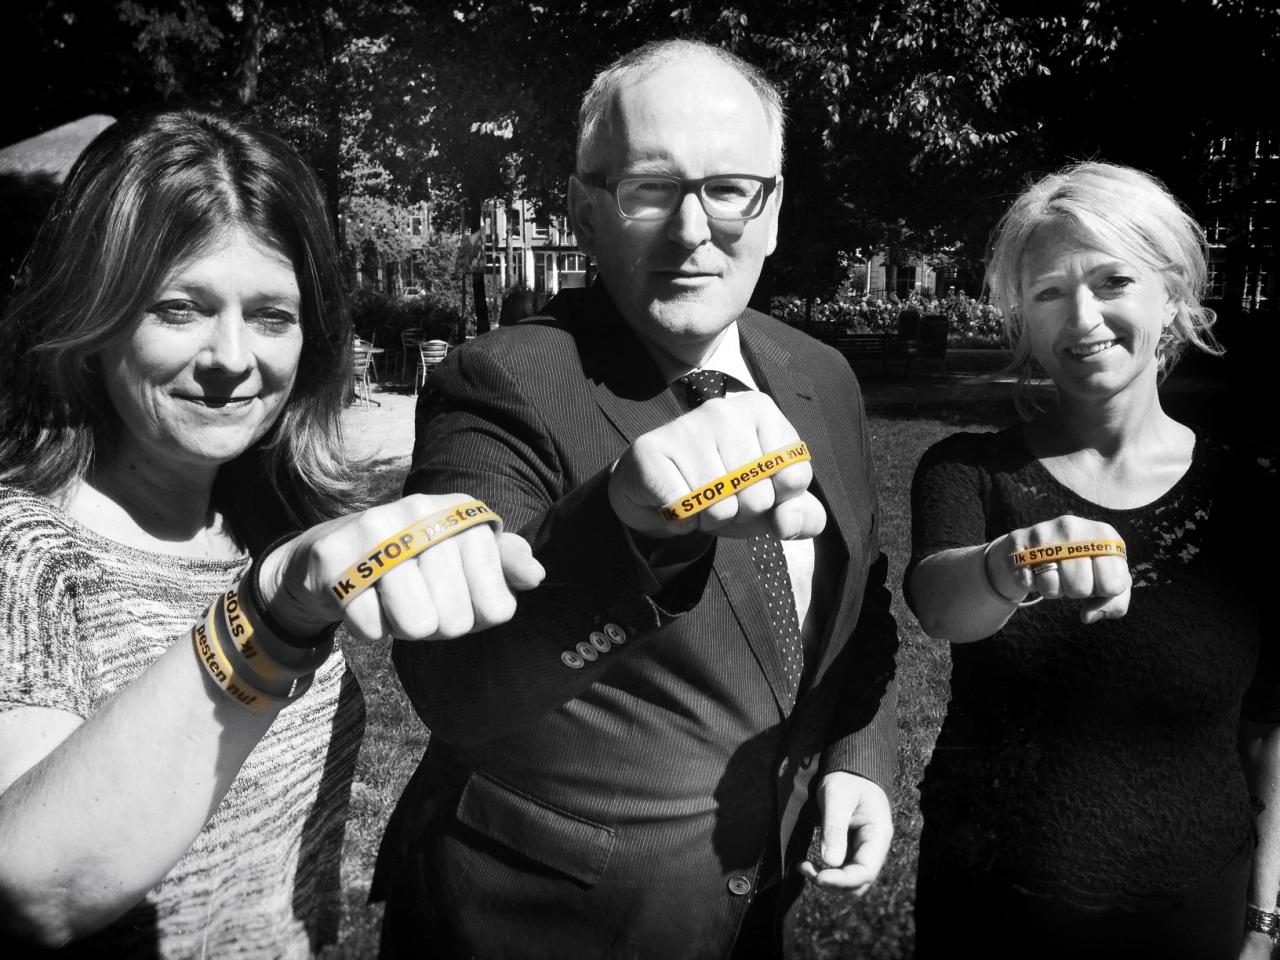 Minister Frans Timmermans met bandje tegen pesten: Ik STOP pesten nu! www.stoppestennu.nl